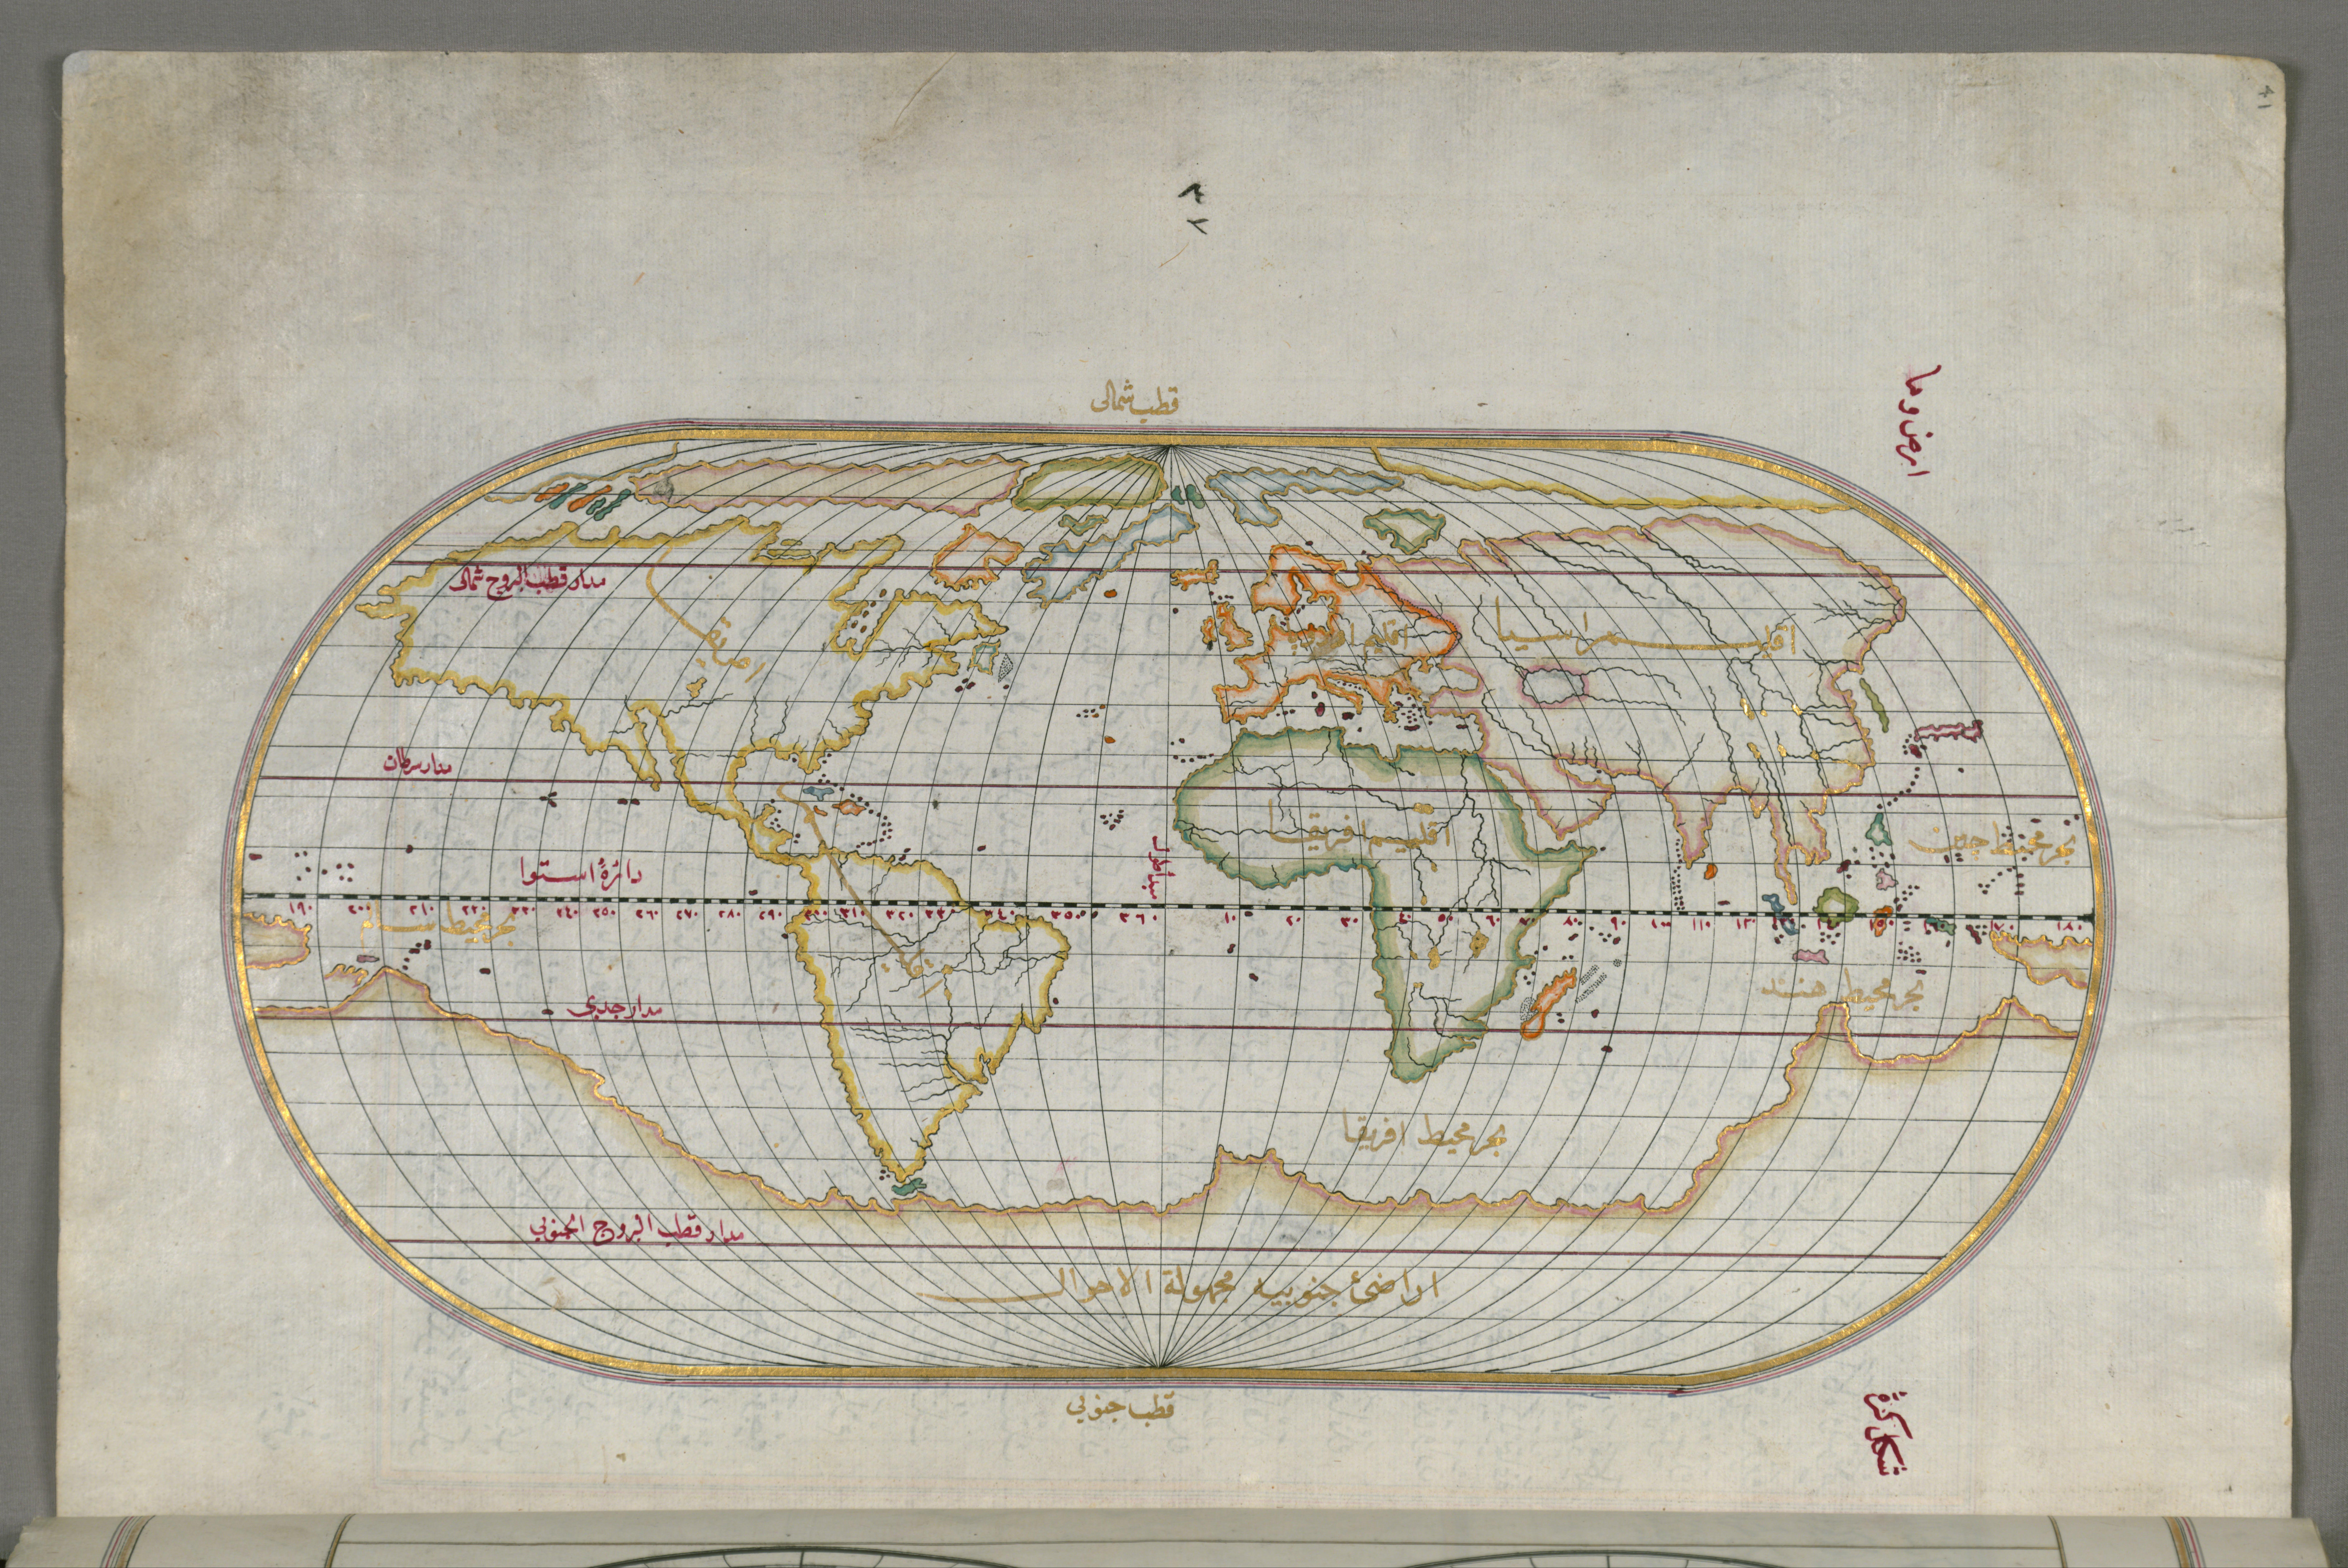 Filepiri reis oval world map google art projectg filepiri reis oval world map google art projectg gumiabroncs Image collections